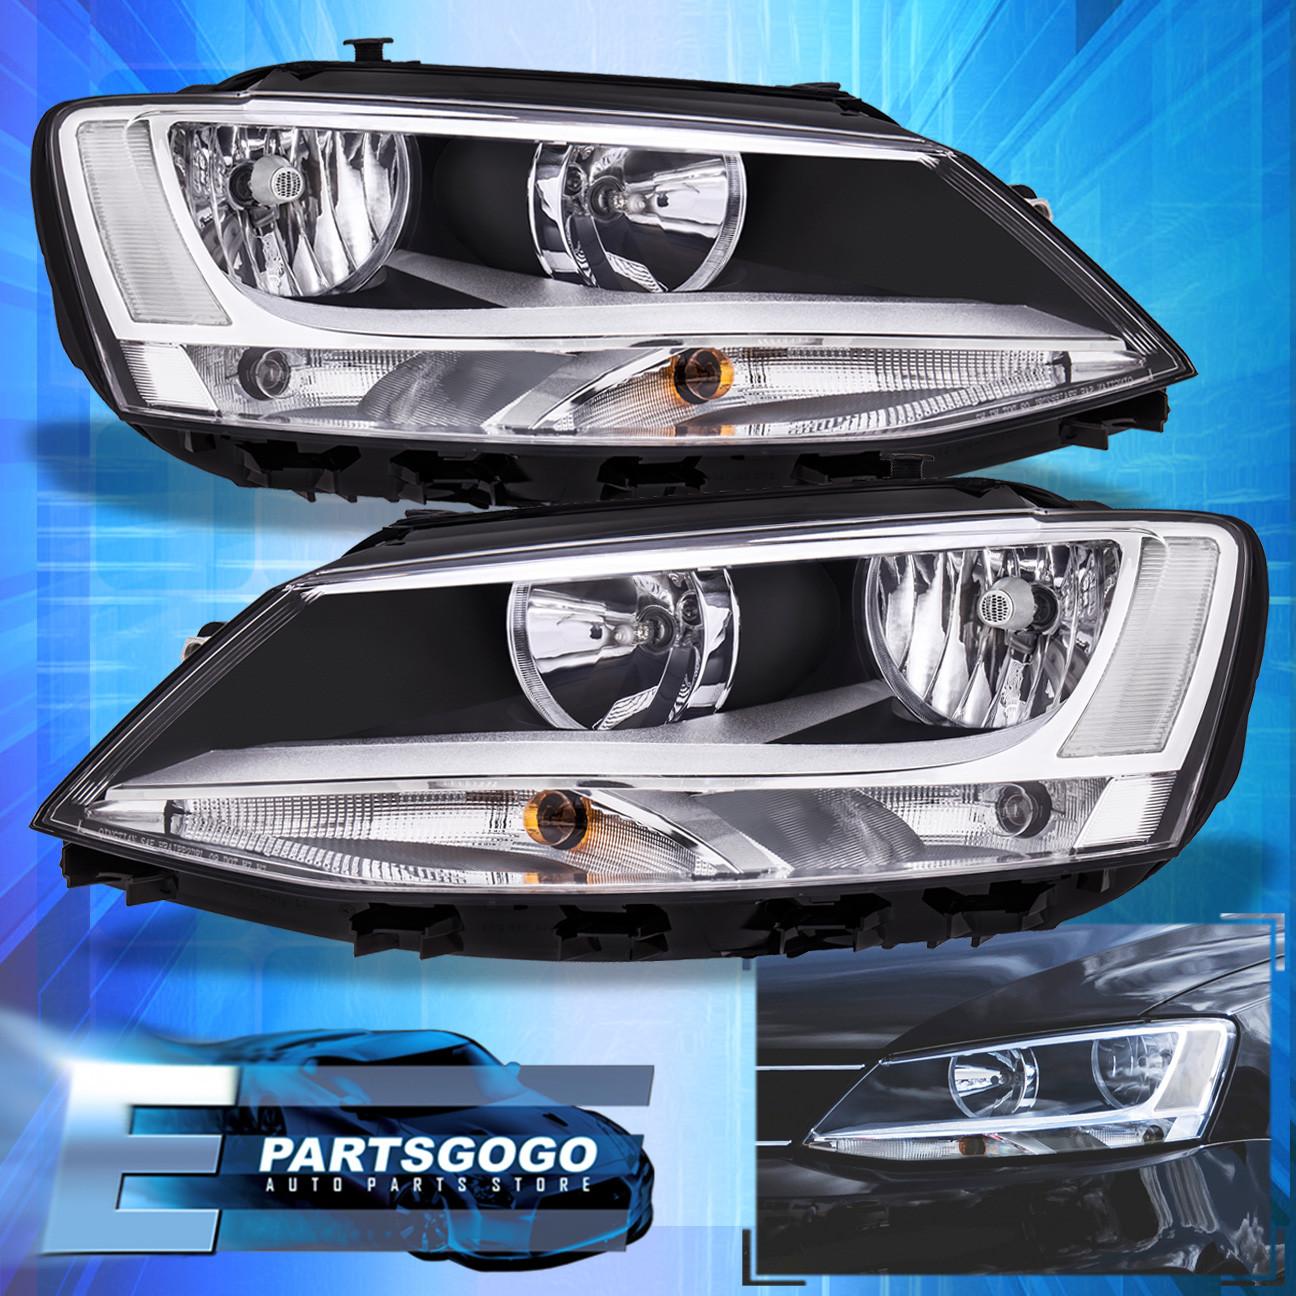 Details About Clear Headlight For 2017 Volkswagen Vw Jetta Headlamps Reflectors